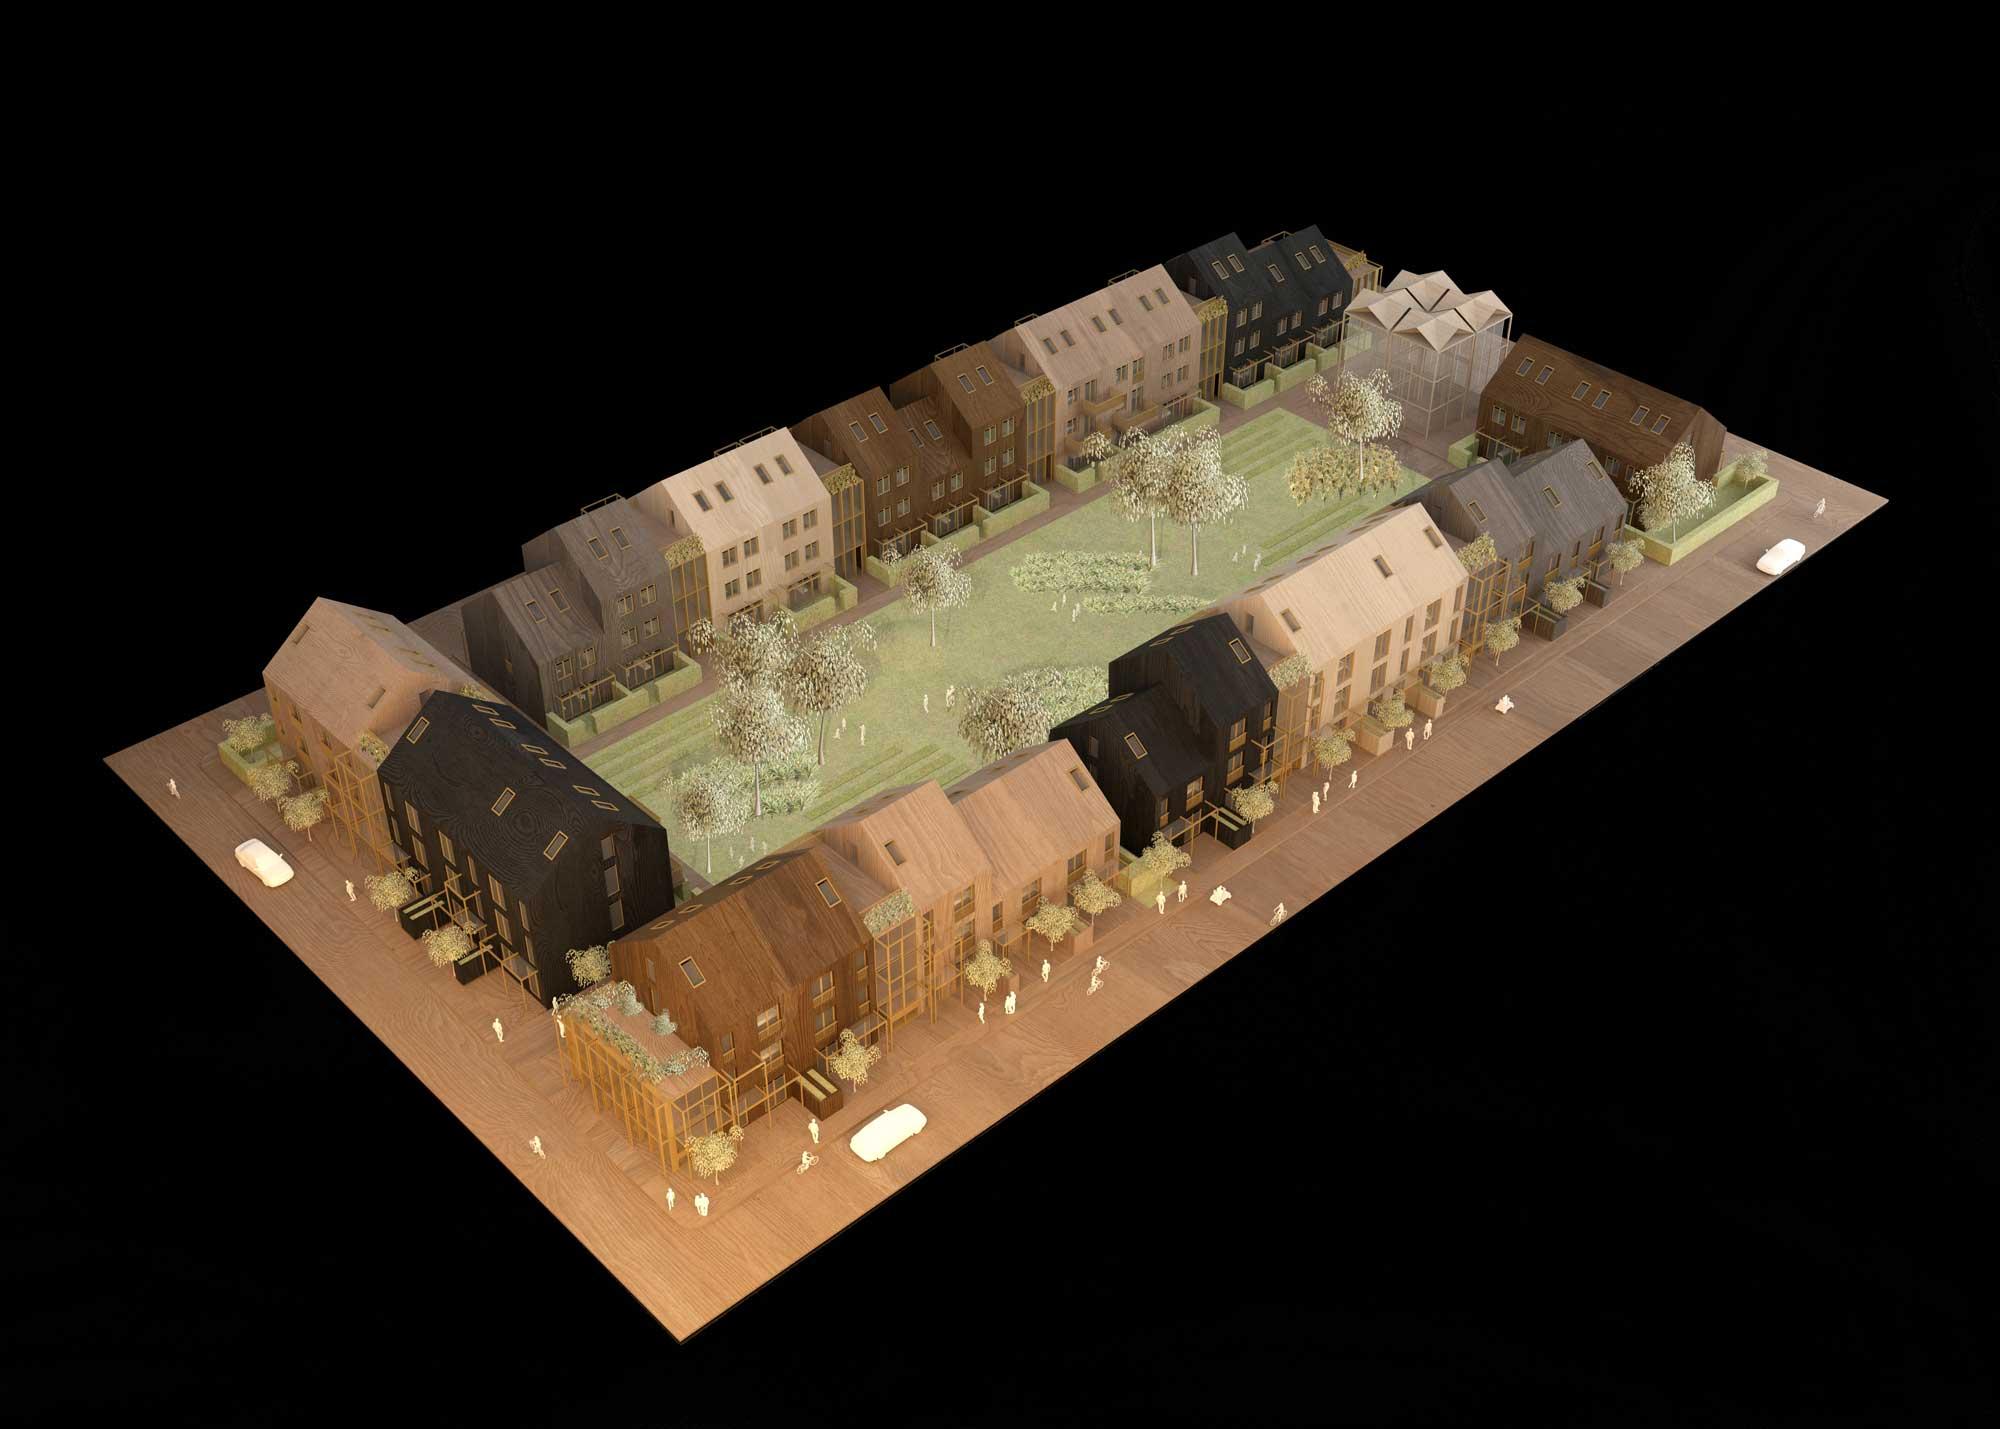 connector-housing-home-of-2030-openstudio-architects-communal-garden